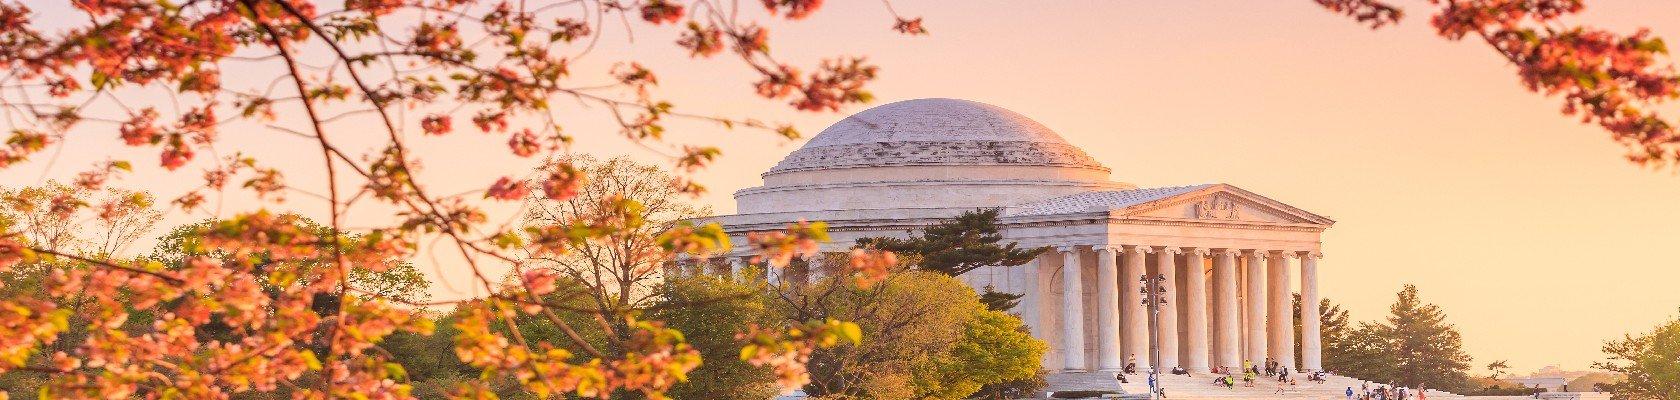 De hoofdstad Washington D.C.